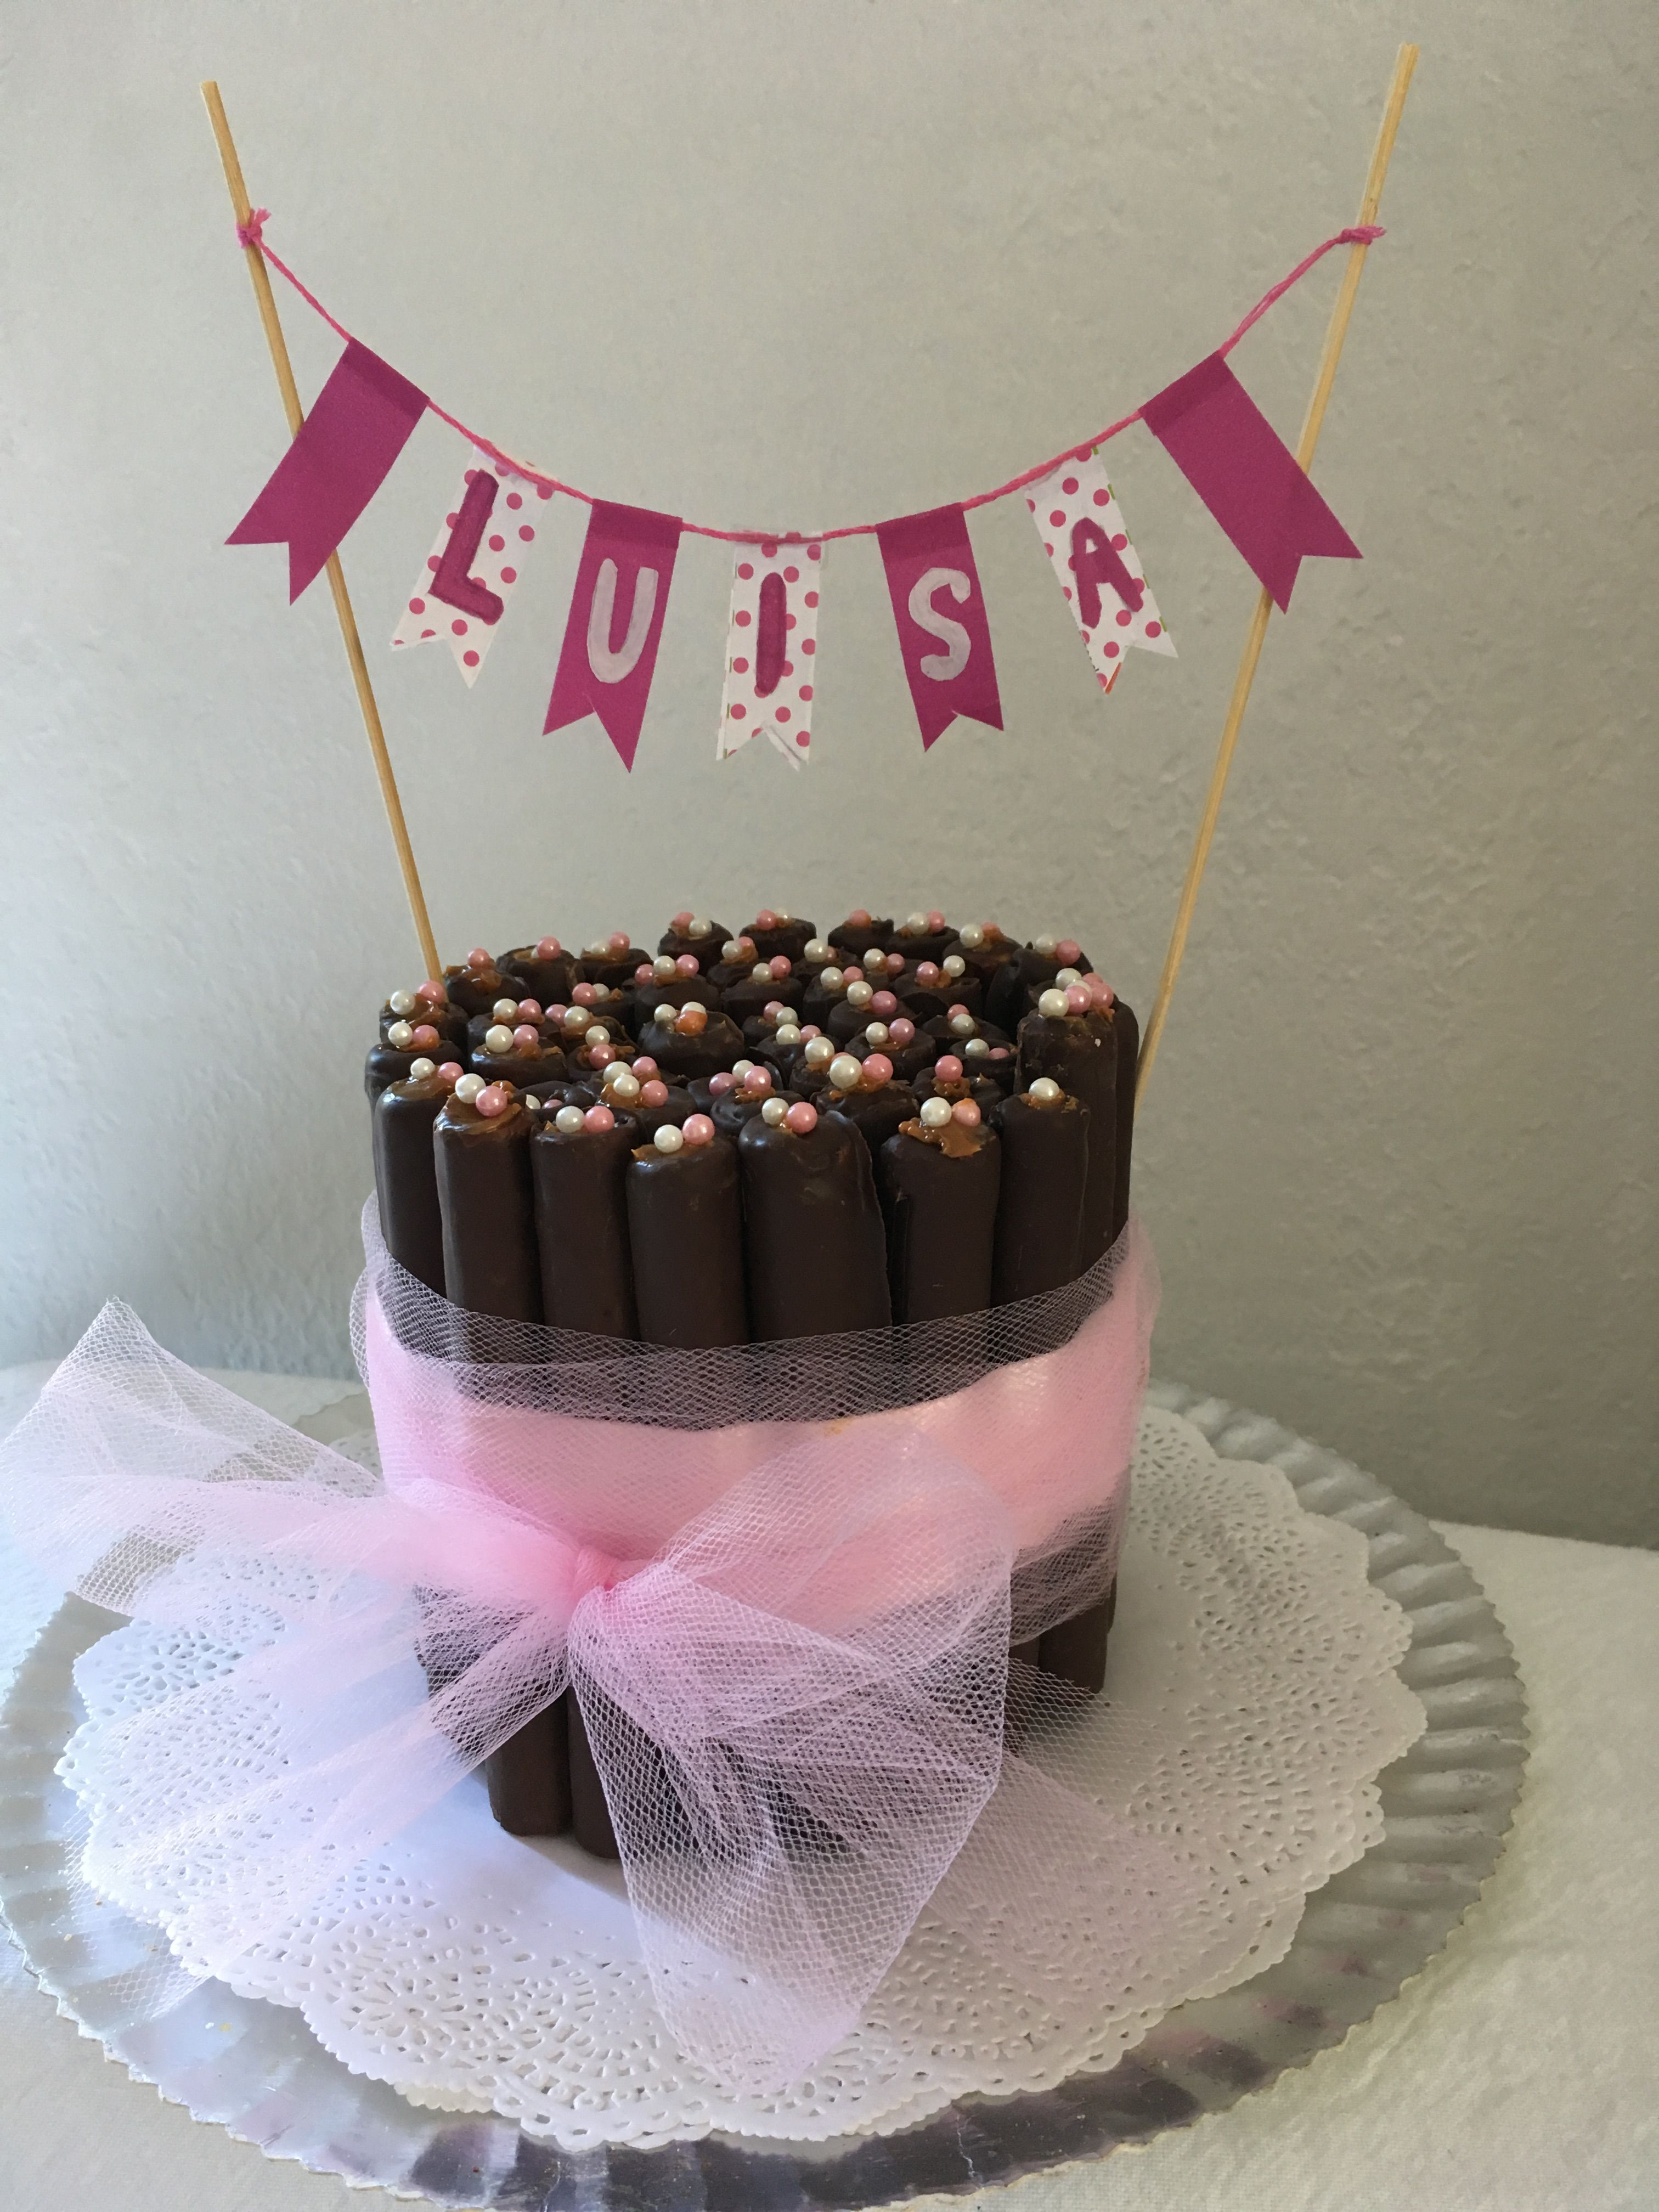 Torta cuchufli | Fiesta | Pinterest | Tortilla, Cumple y Cumpleaños